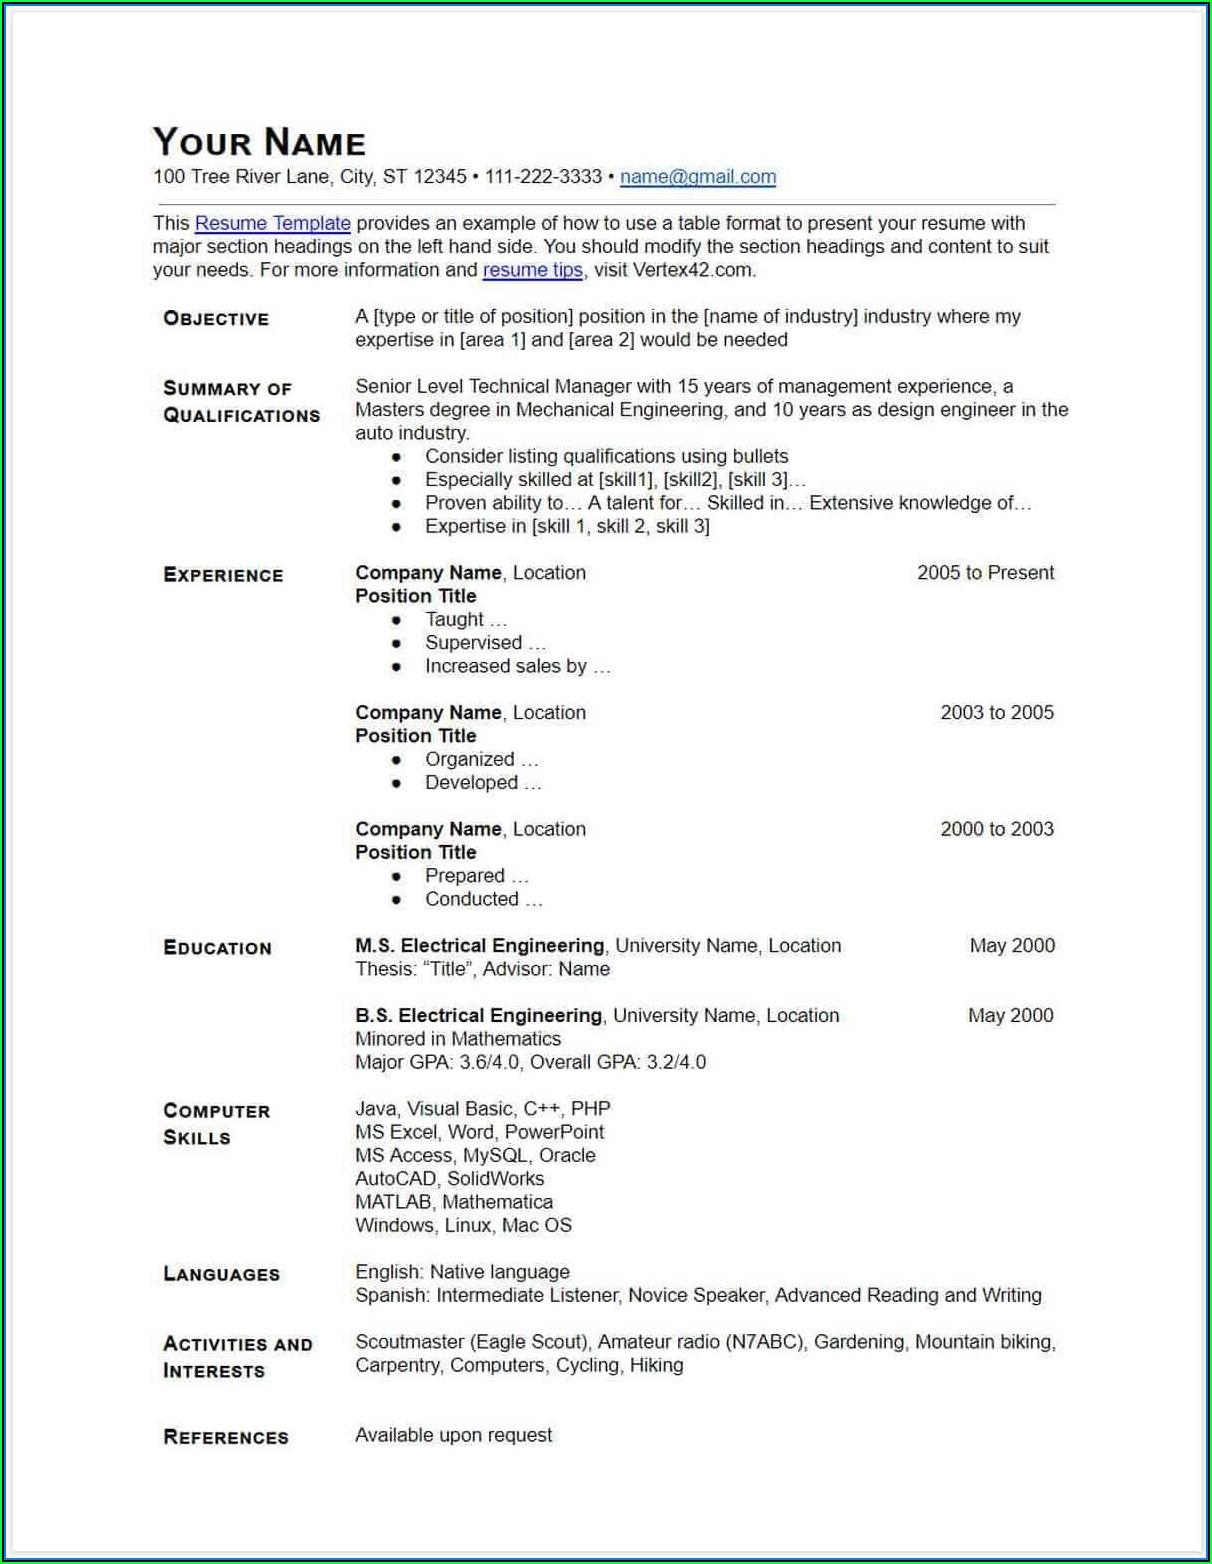 Free Downloadable Resume Templates Google Docs